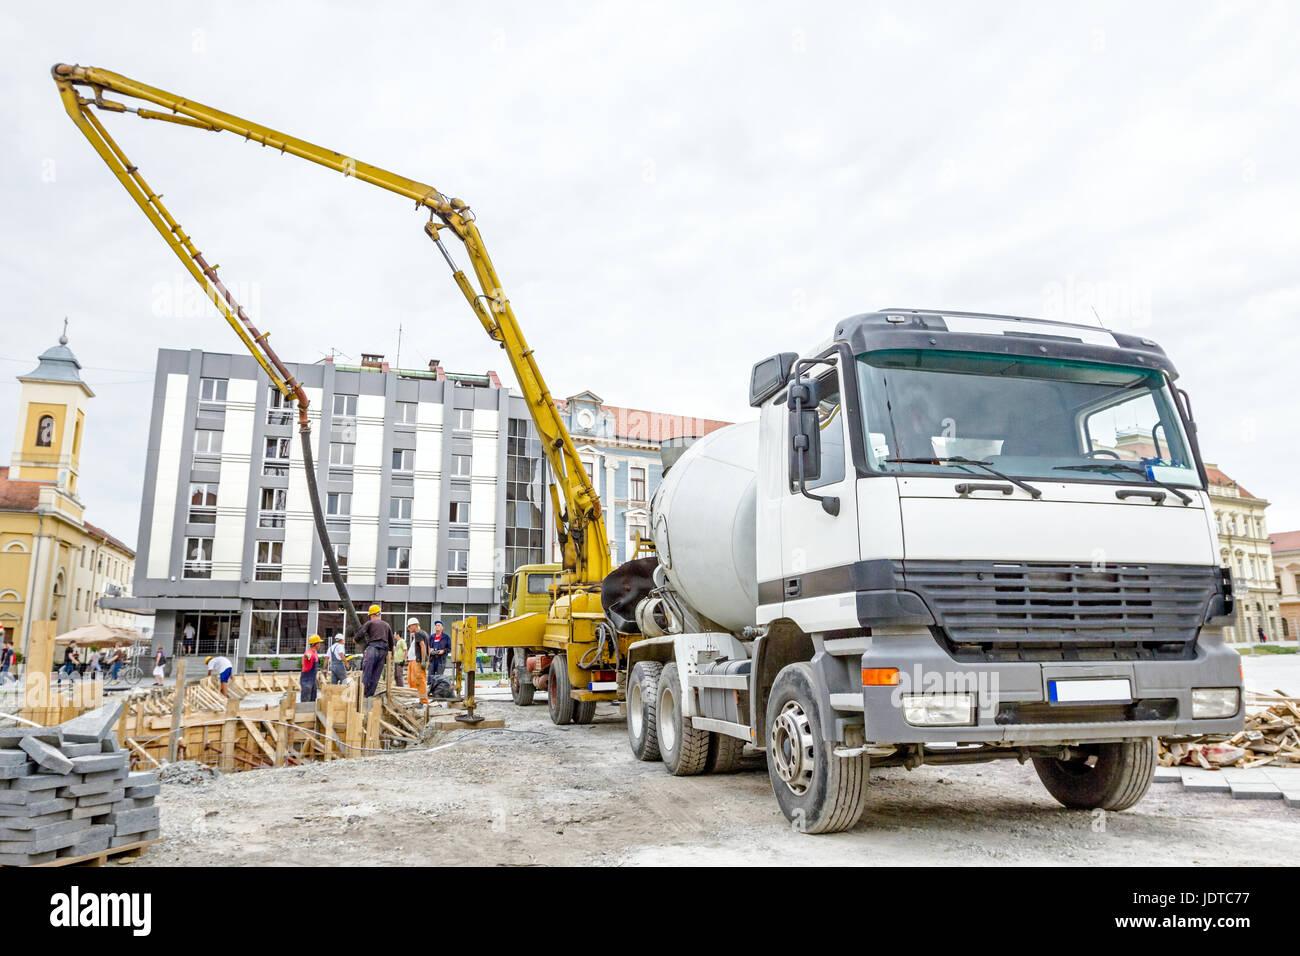 Truck mixer is pouring concrete into concrete pump for casting. - Stock Image